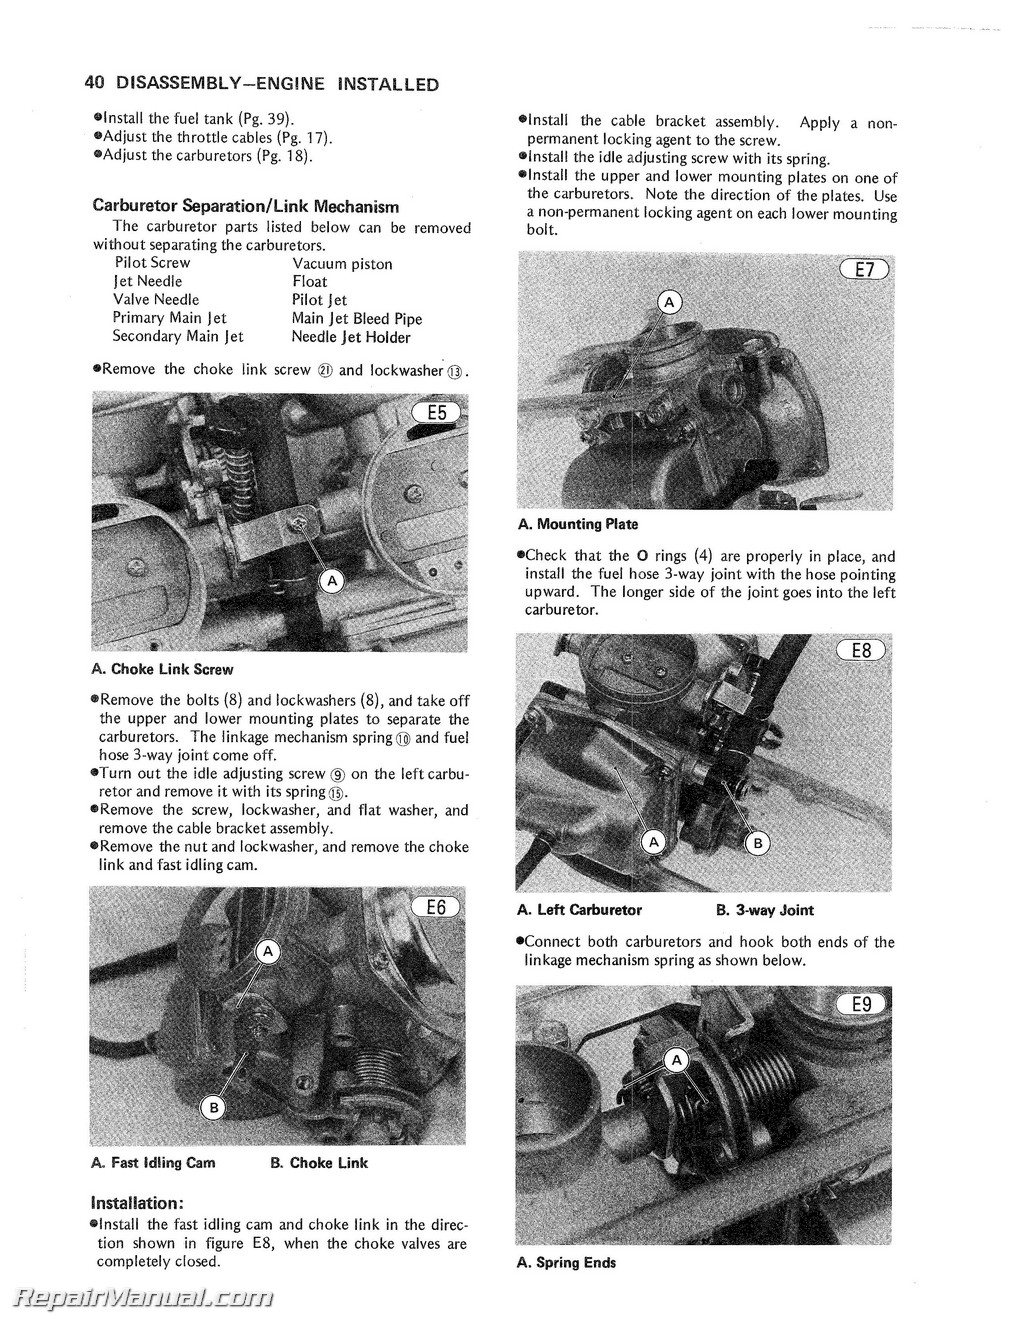 1983 chevy 305 wiring diagram 3bf77 kawasaki csr 305 wiring diagram wiring resources  3bf77 kawasaki csr 305 wiring diagram